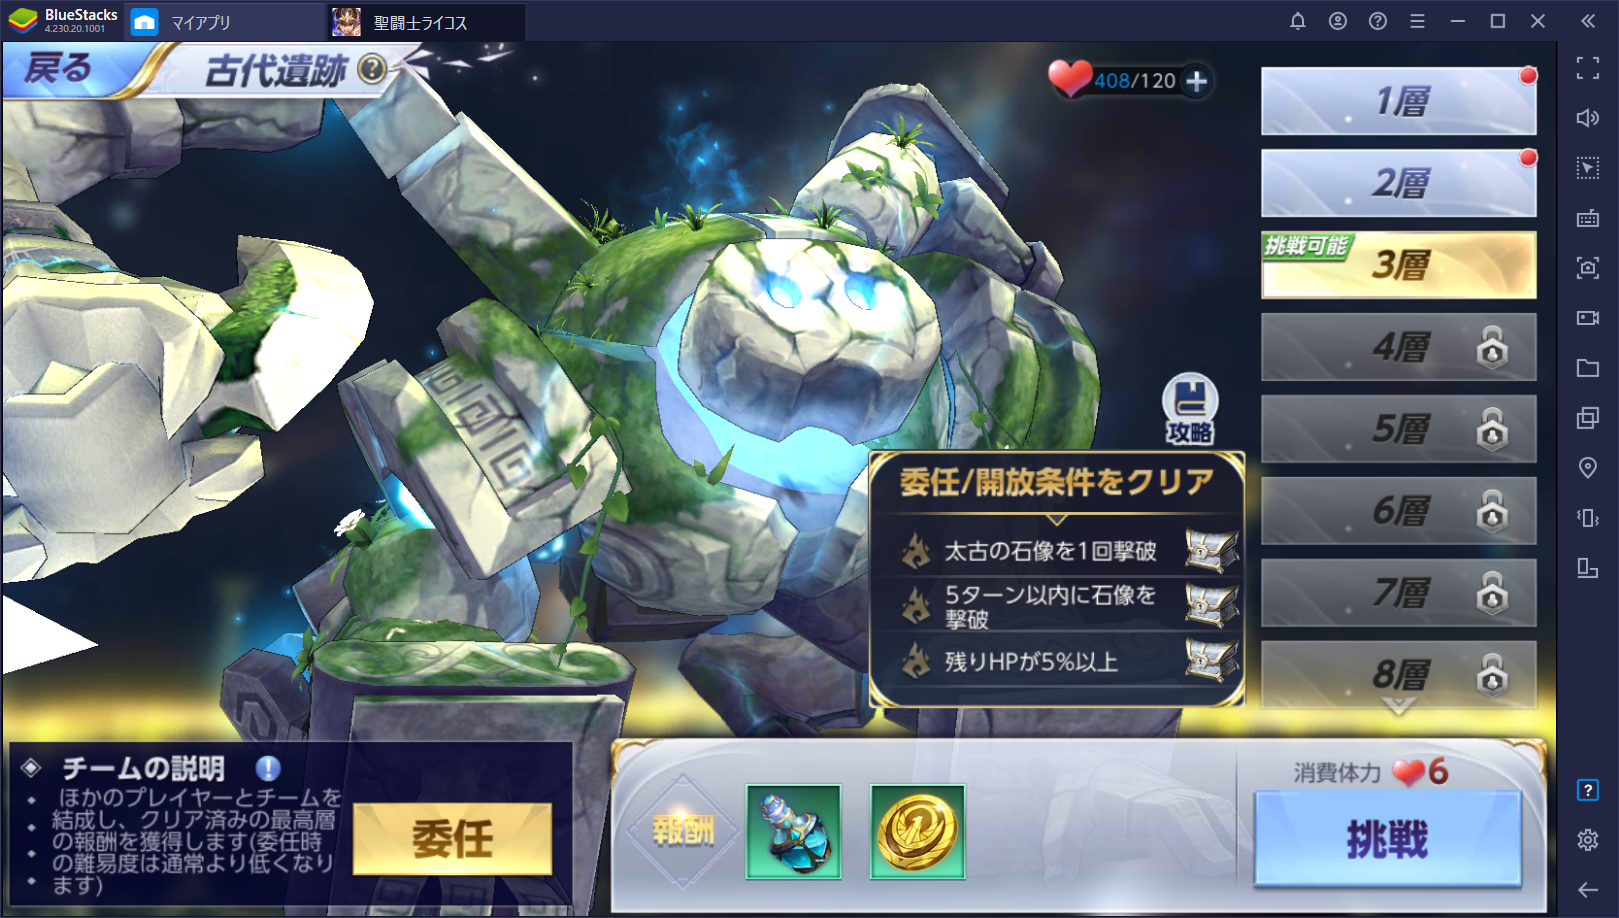 BlueStacks:『聖闘士星矢 ライジングコスモ』の基本的な遊び方と攻略ポイント